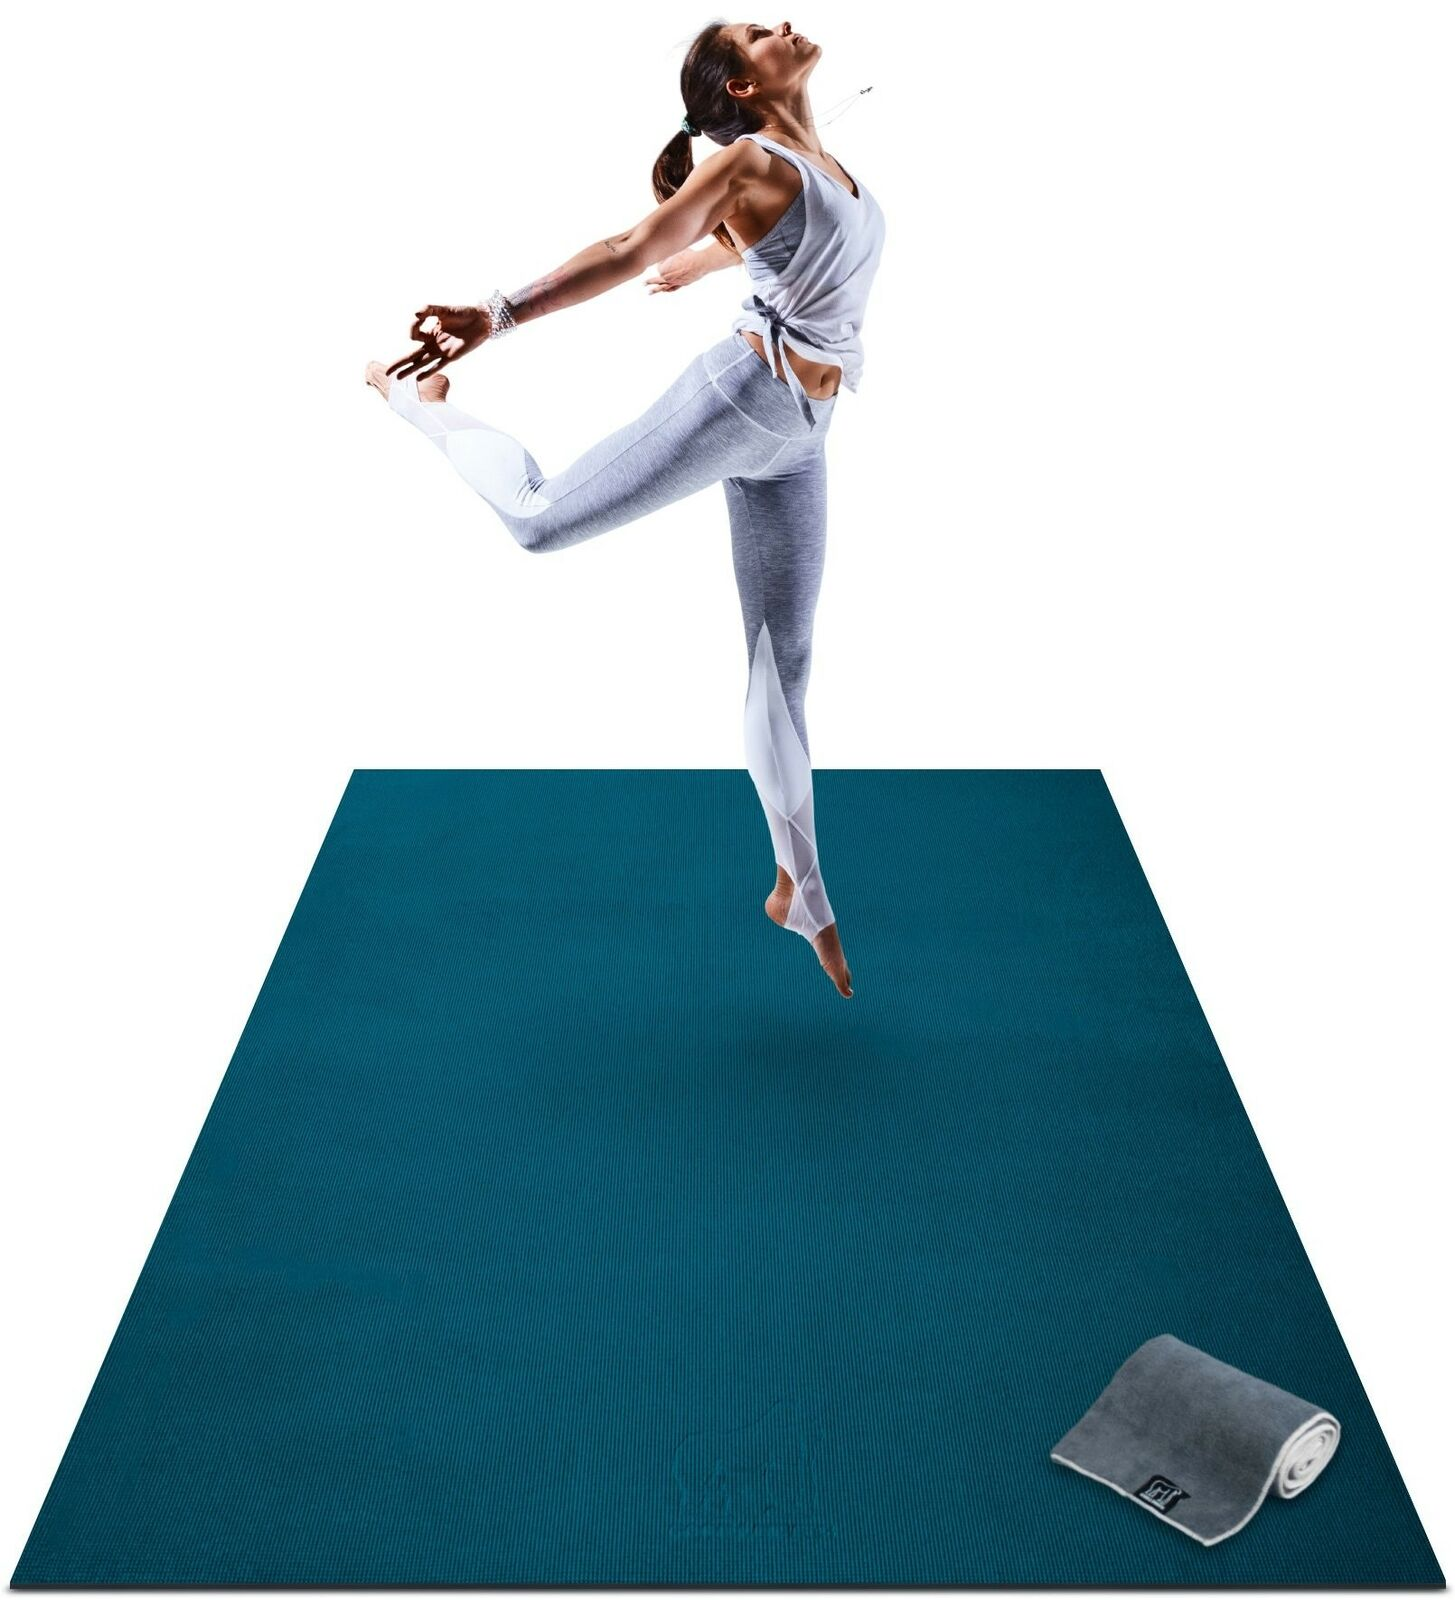 Premium Extra Large Yoga Mat - 6' x 4' x 8mm Extra Thick & Comfortable Blau